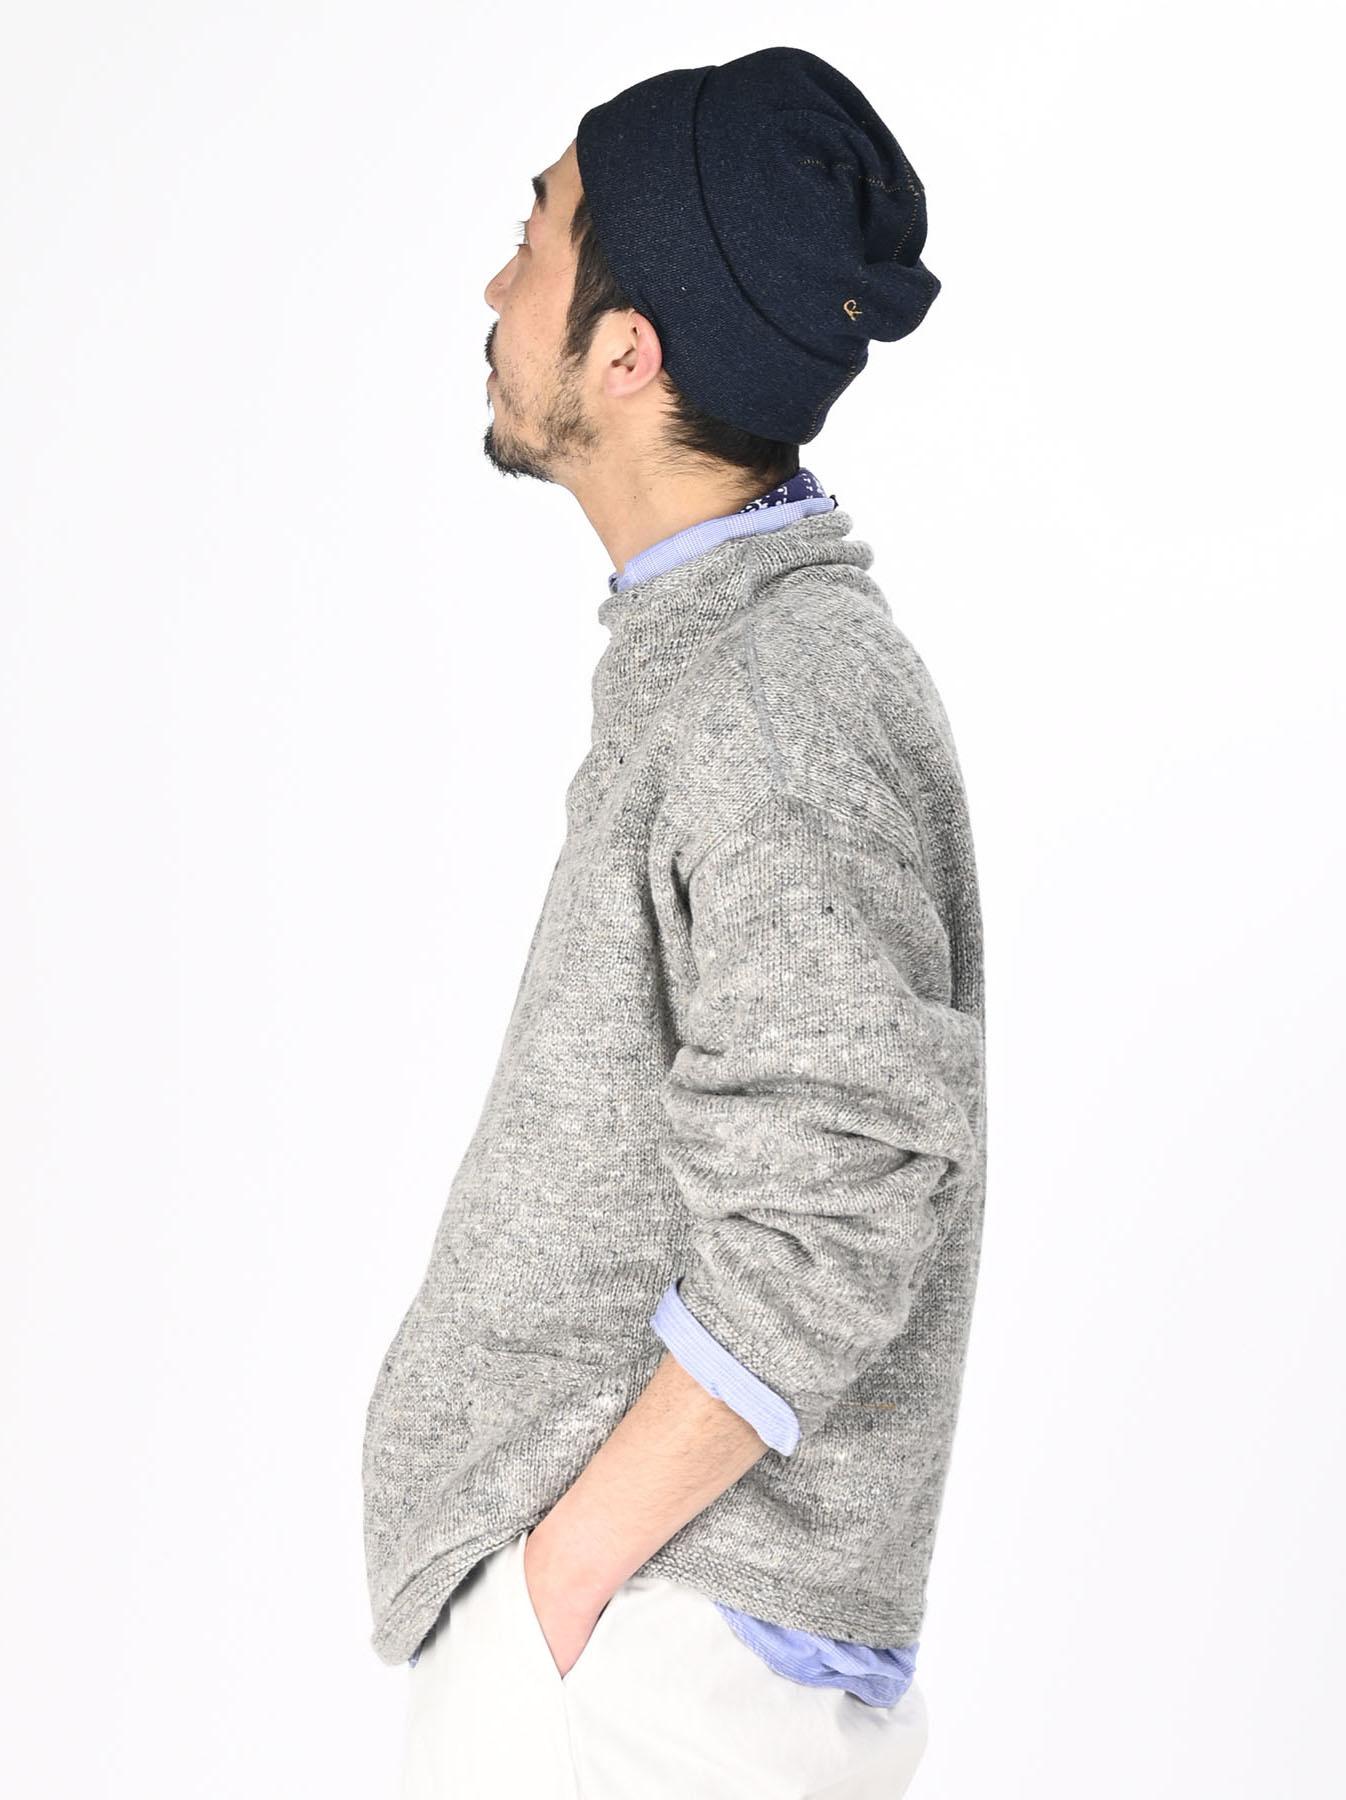 WH Linen Tweed Knit-sew 908 Umahiko Sweater (0321)-4